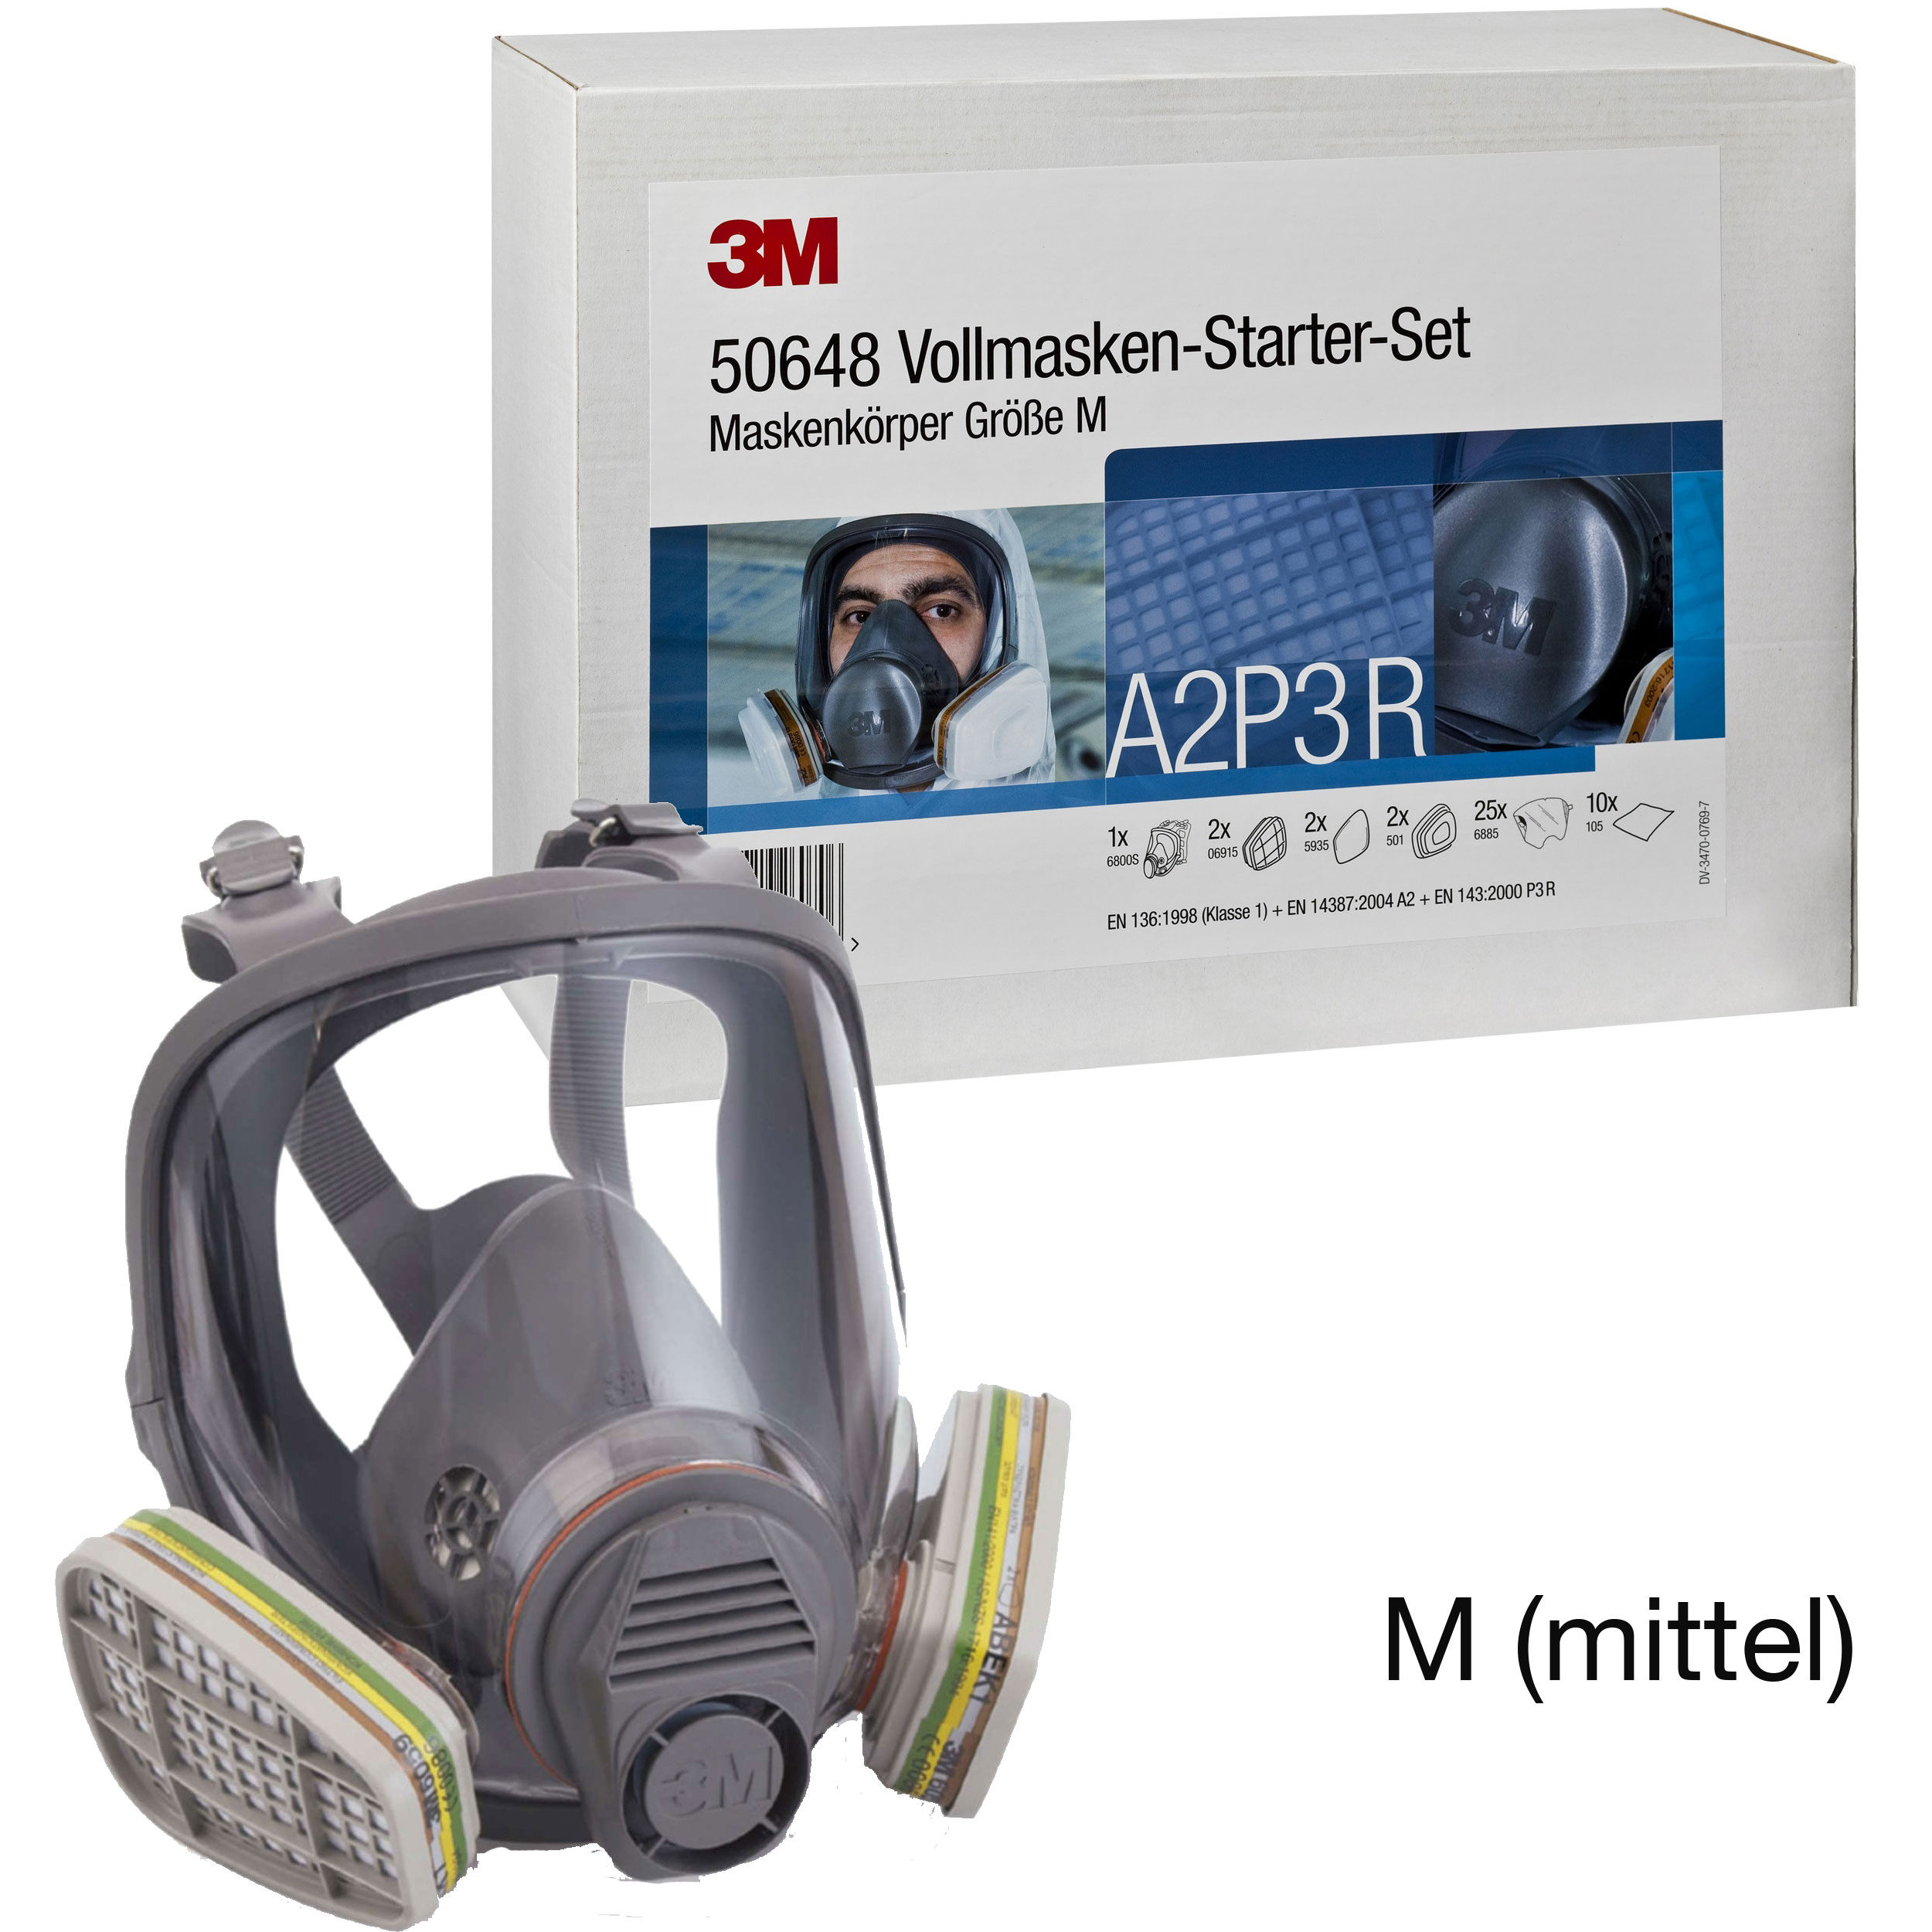 3M 6800Kit (50648) Starterkit Atemschutz-Vollmaske, Maskenkörper aus Silikon, A2P3, Grösse M (mittel)